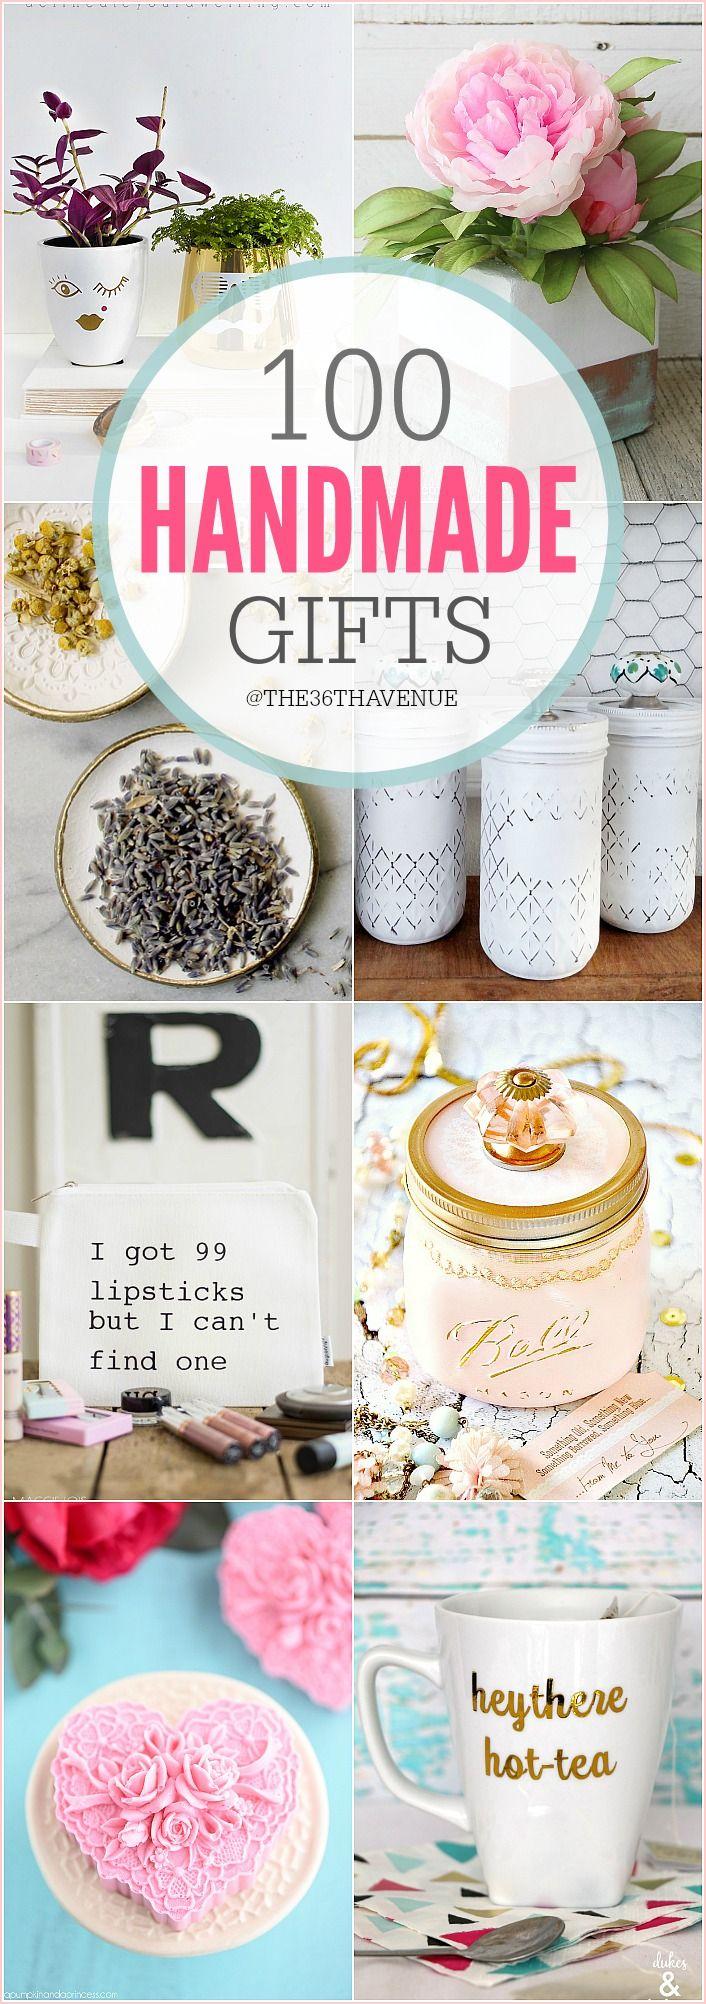 100 Handmade Gifts Diy Women Gifts Handmade Gifts Diy Diy Christmas Gifts Creative Diy Gifts